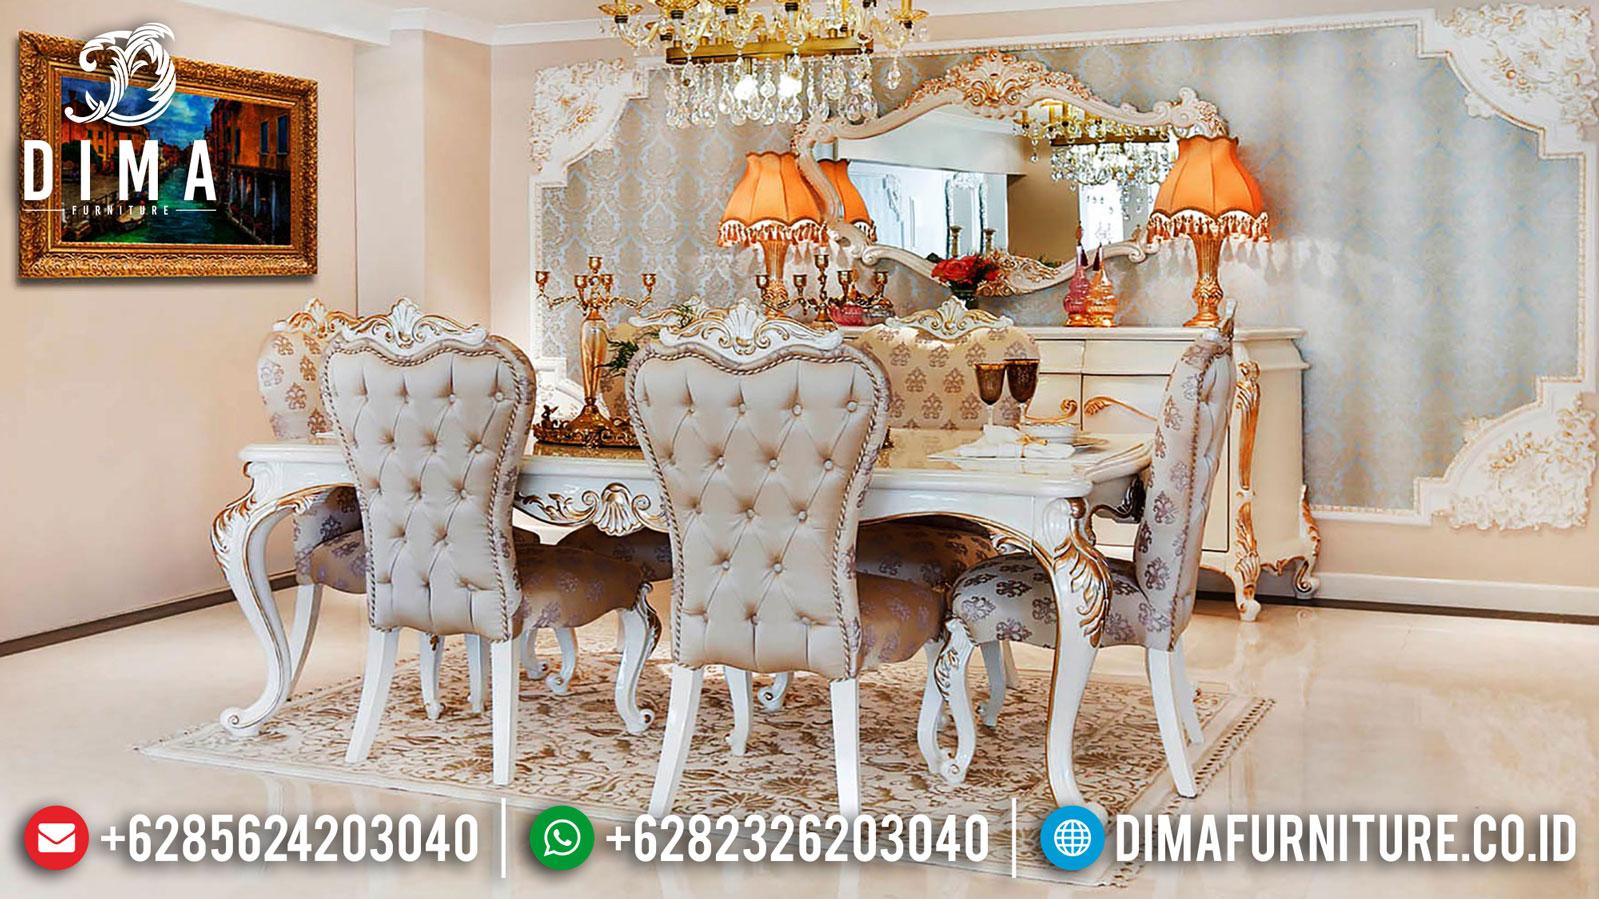 Jual Meja Makan Mewah Luxury Type Furniture Jepara Release Terbaru ST-1028